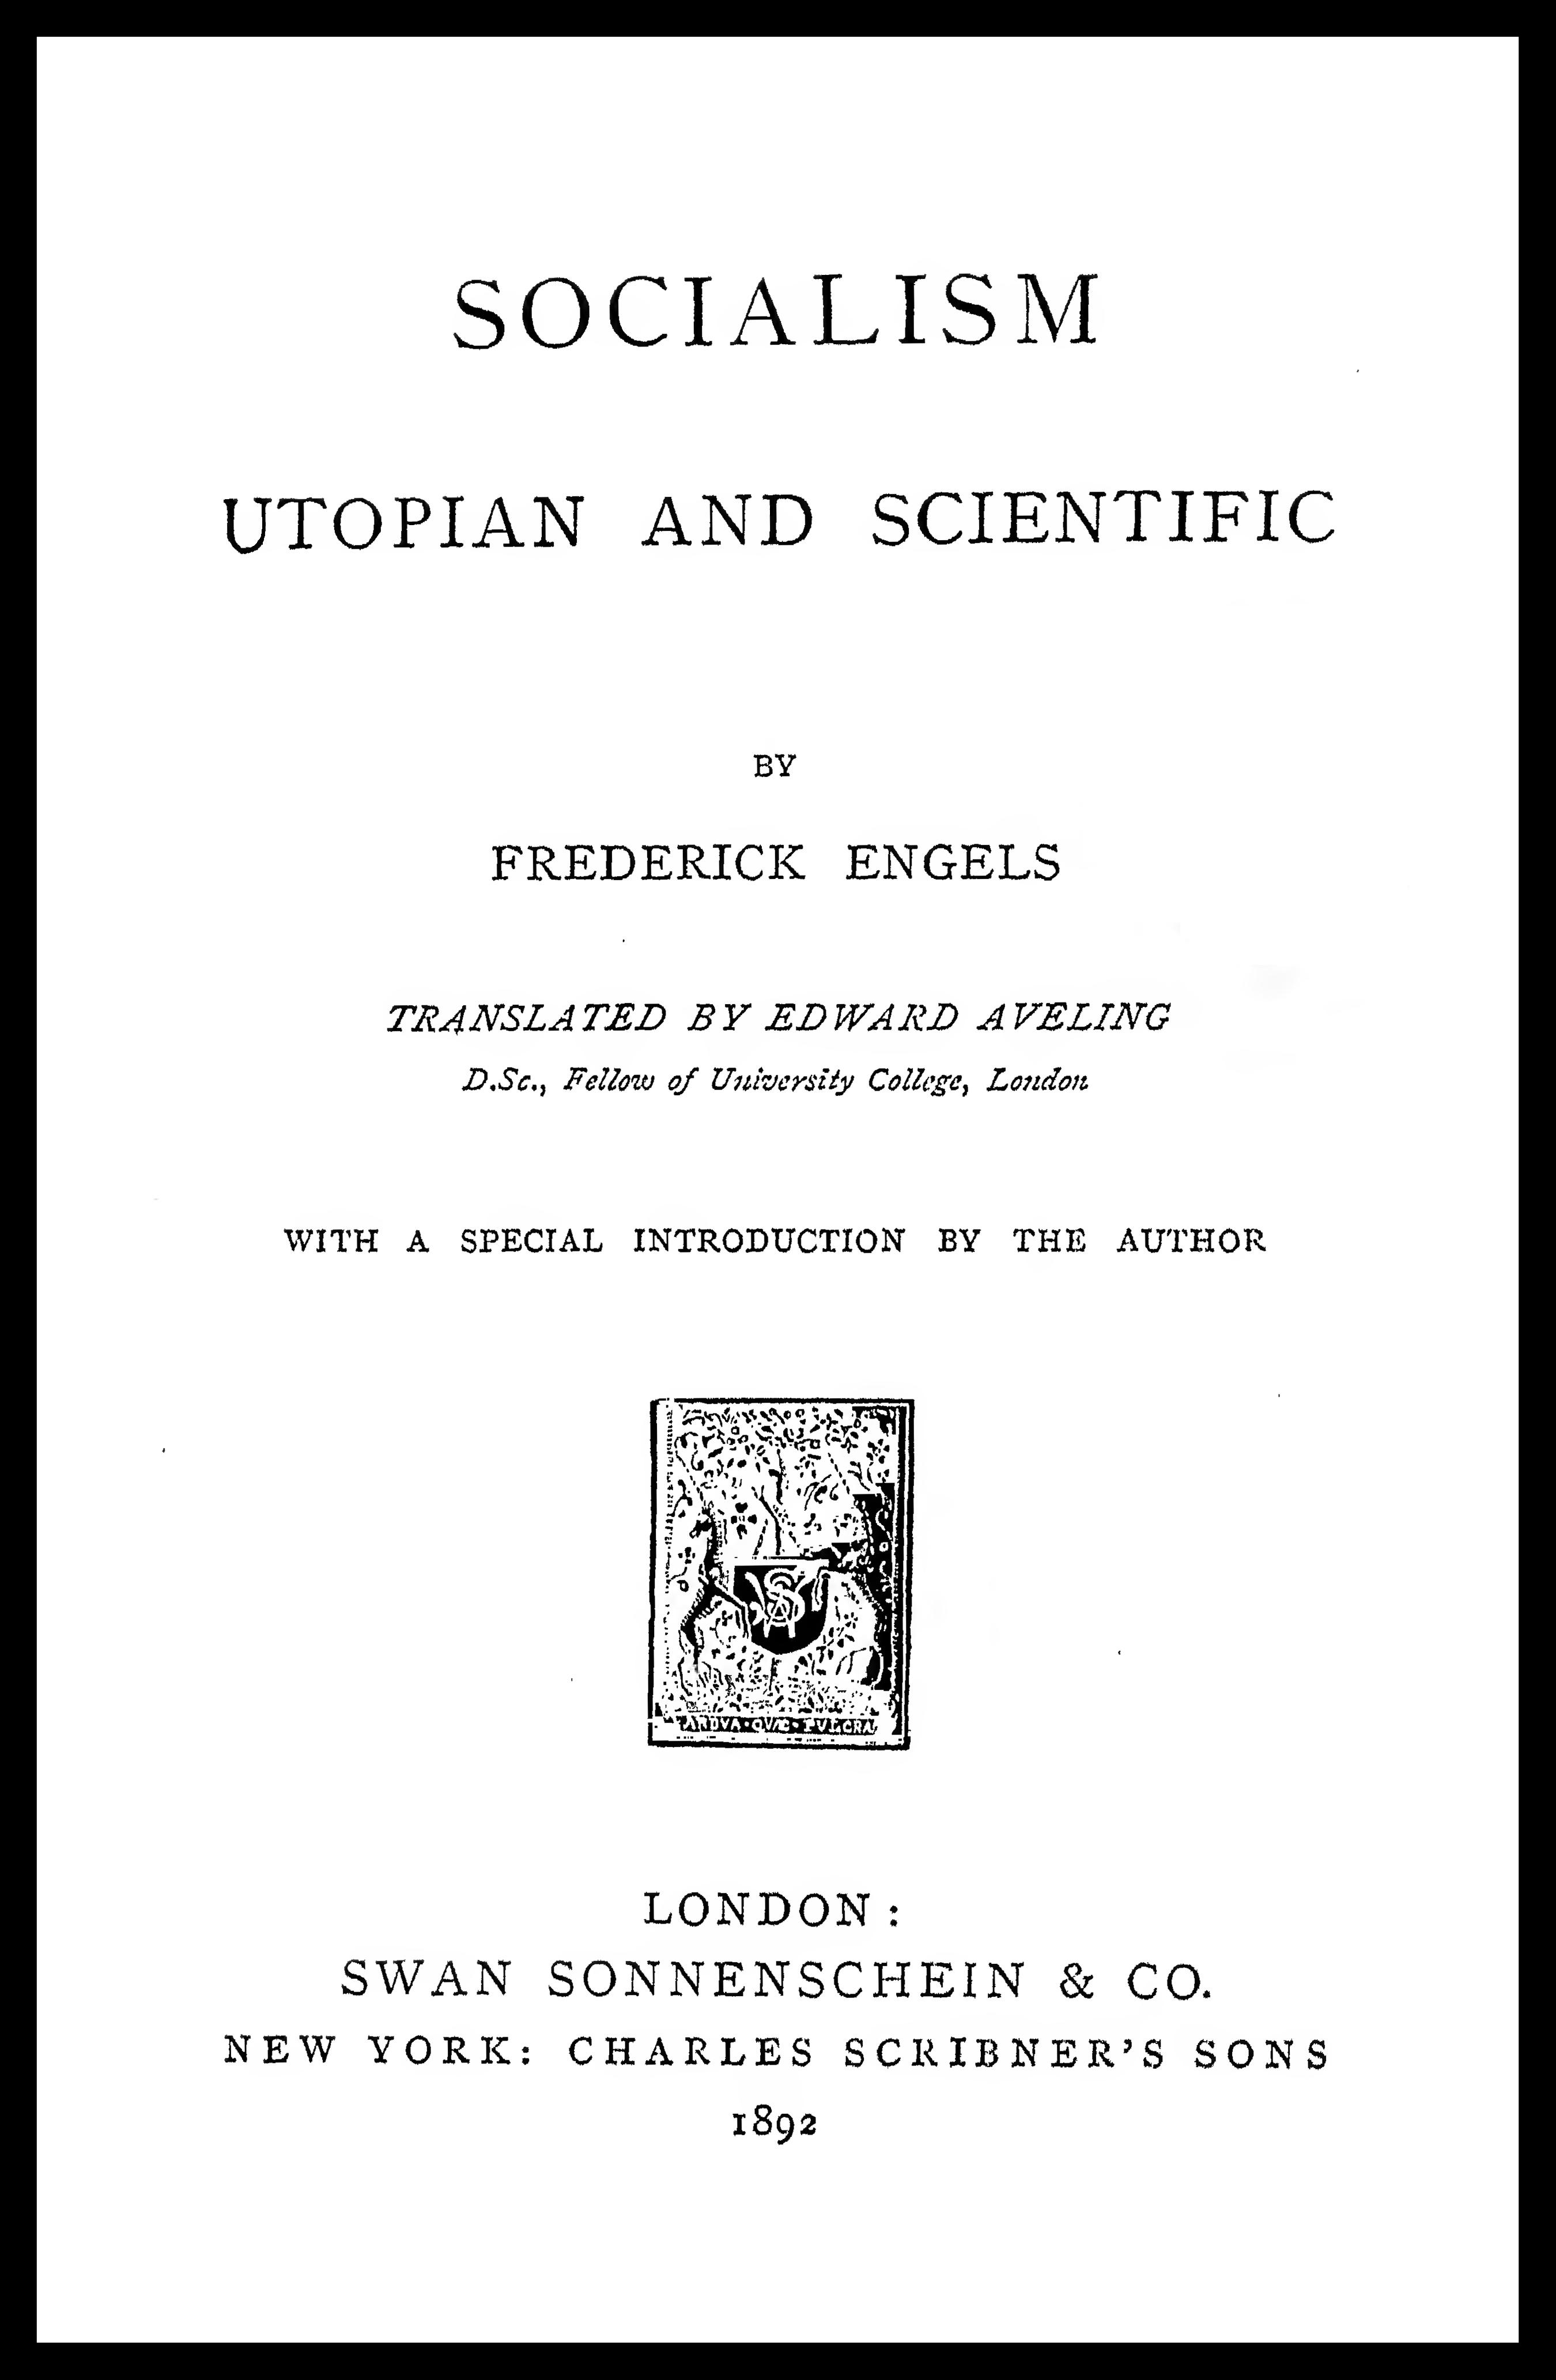 Socialism: Utopian and Scientific - Wikipedia